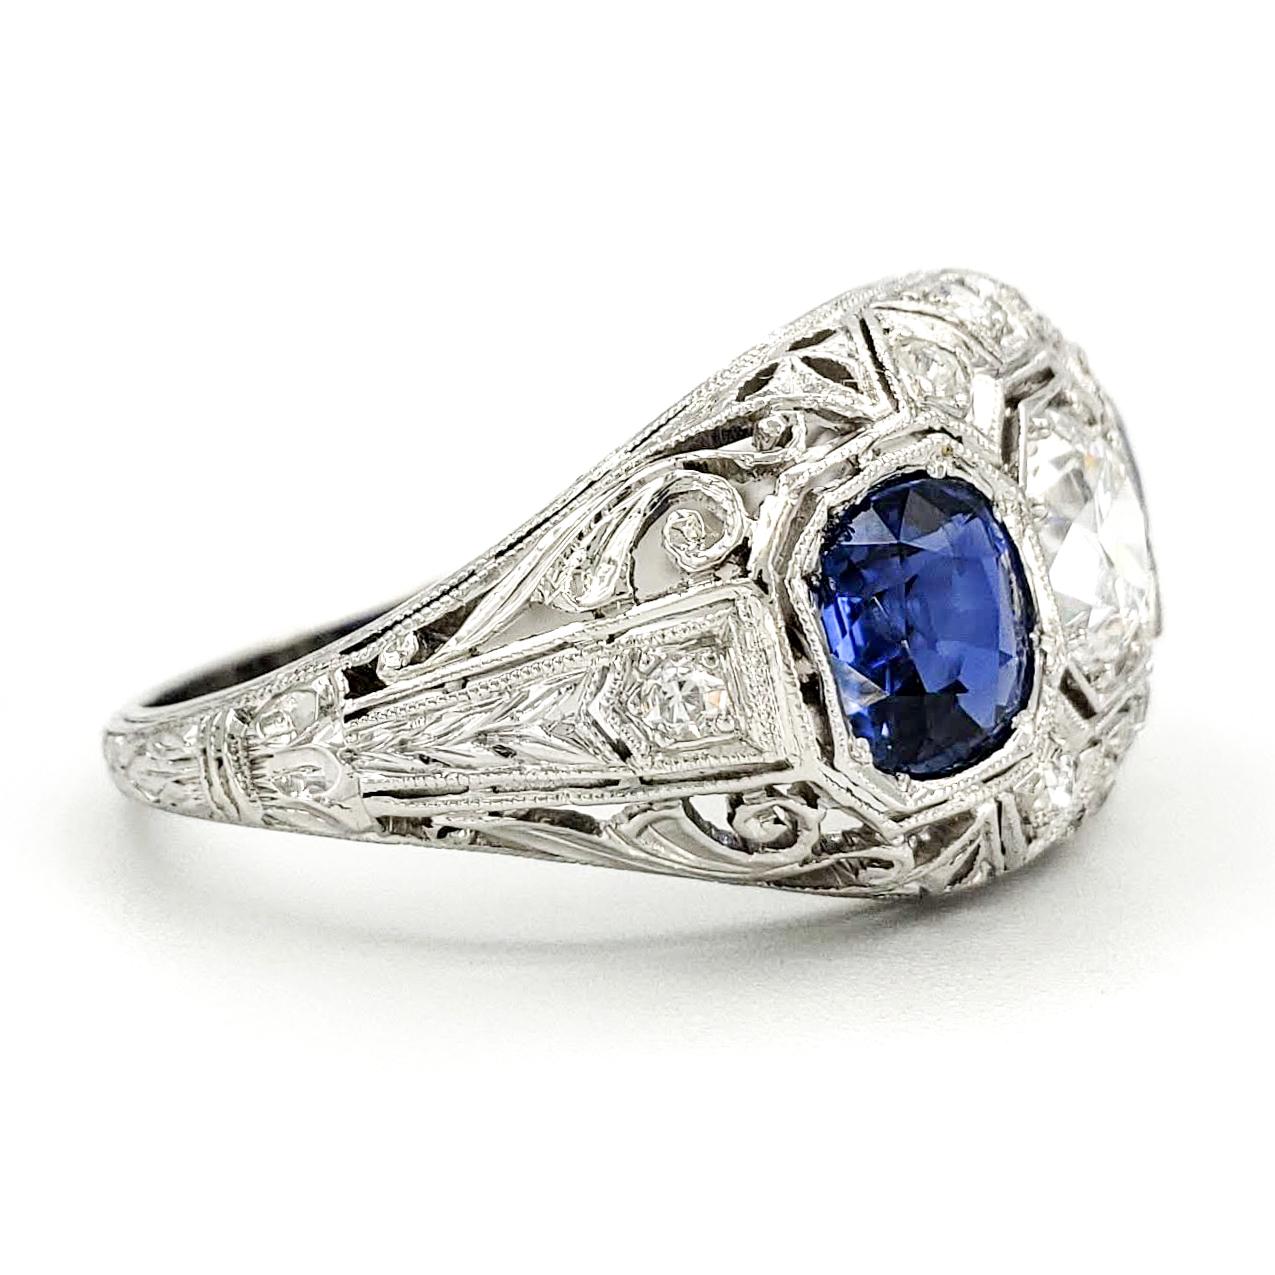 estate-platinum-engagement-ring-with-0-77-carat-old-european-cut-diamond-gia-e-vs2